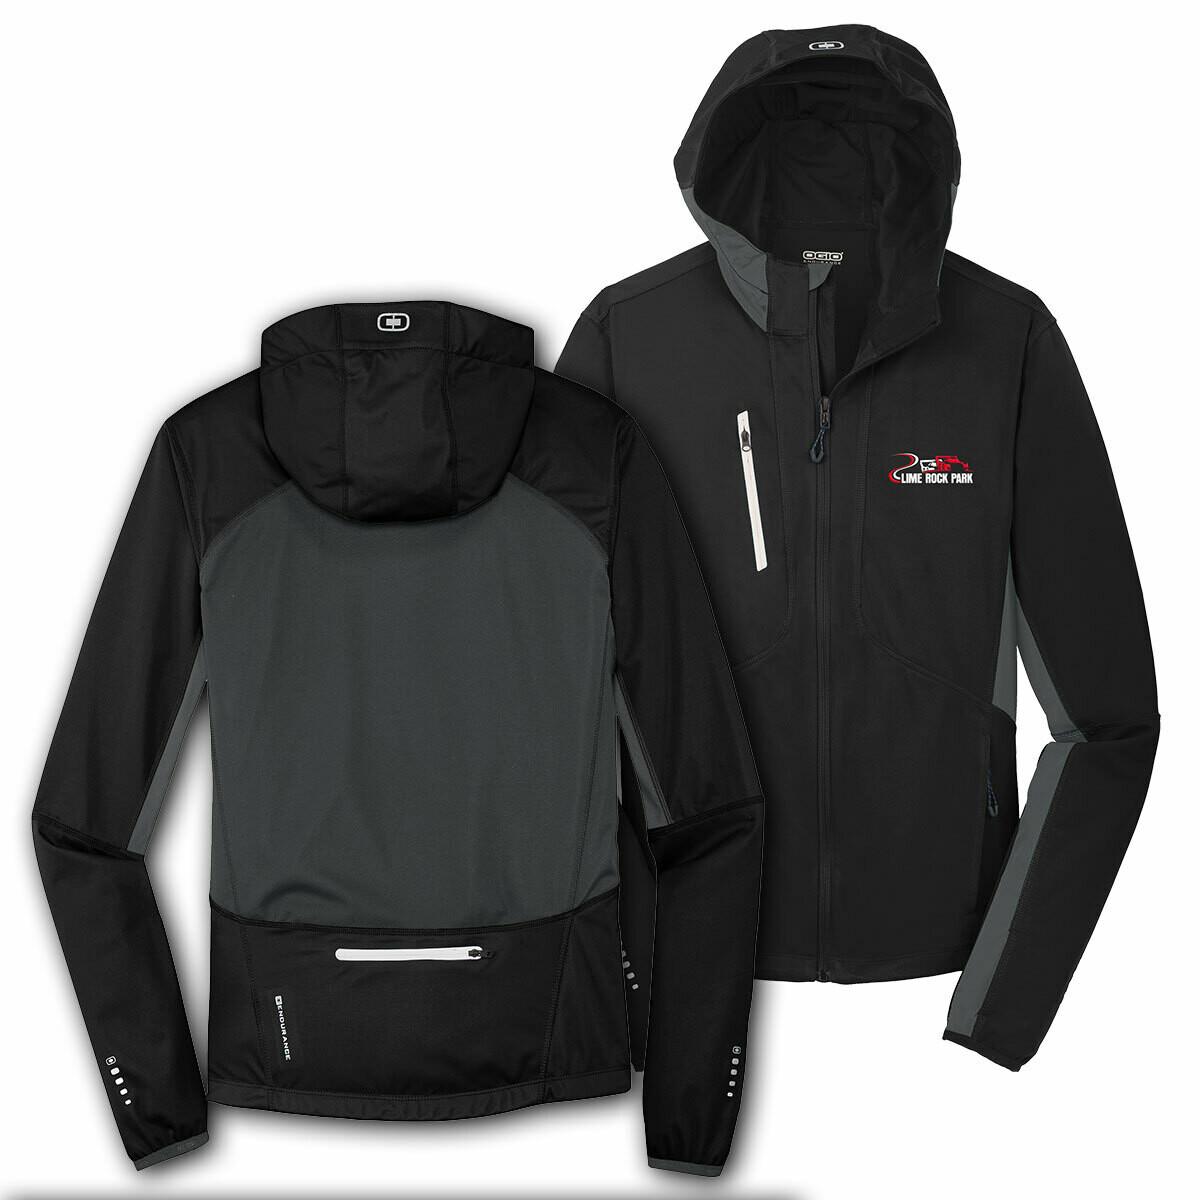 Ogio Pivot Jacket - Blk/Gear